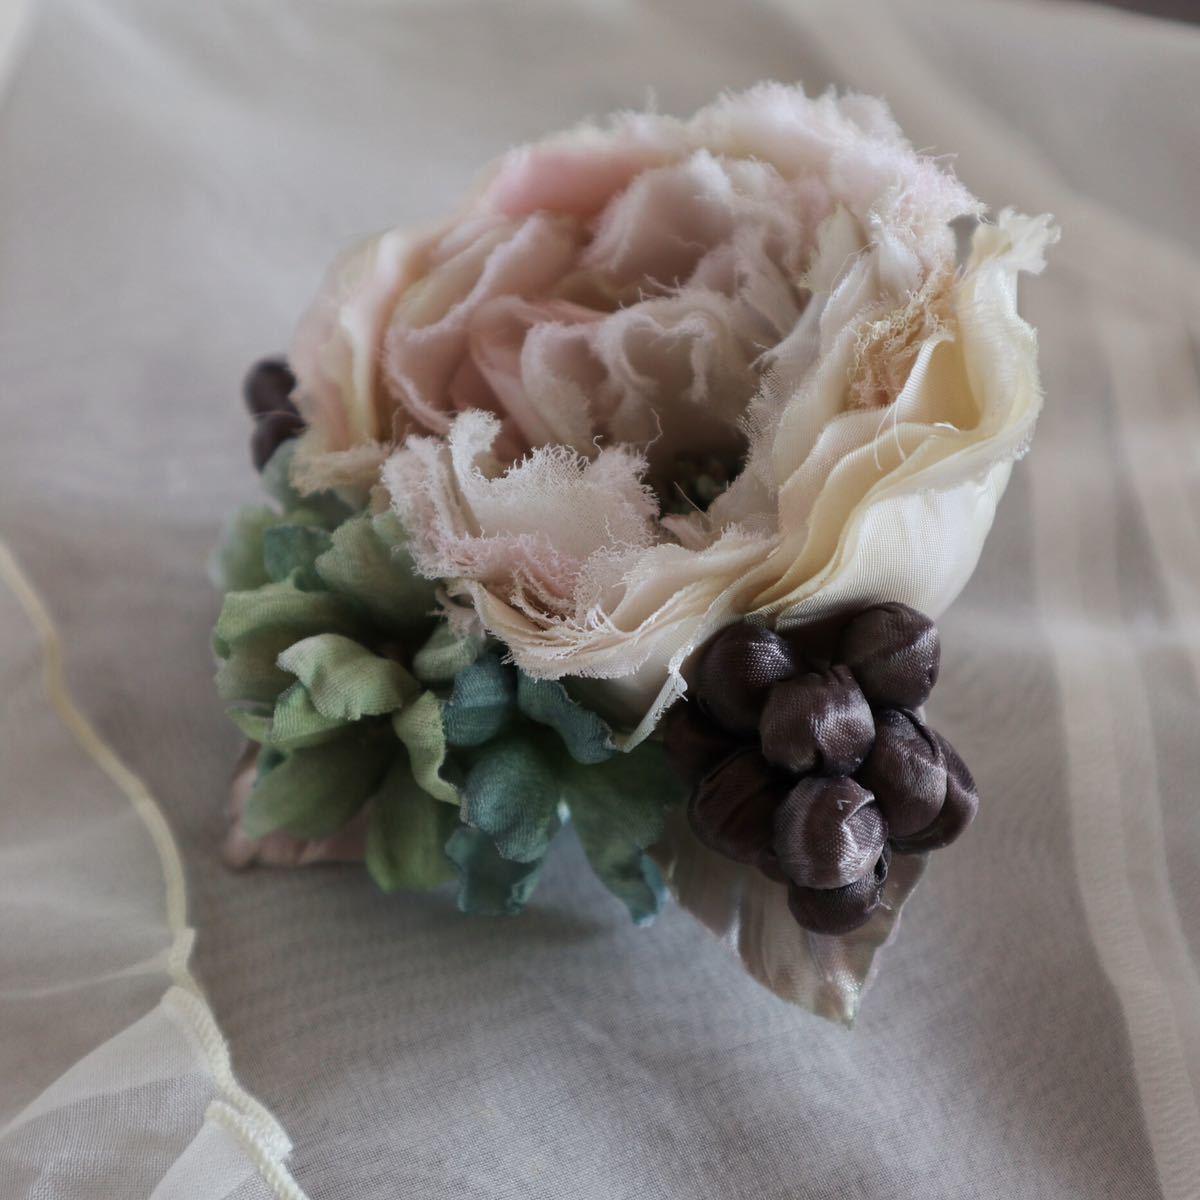 *kashun* ハンドメイド 布花のアンティークカラーのミニブーケ風コサージュ6 ピンクのバラとアジサイ /染花/卒園式/卒業式/入学式_画像3